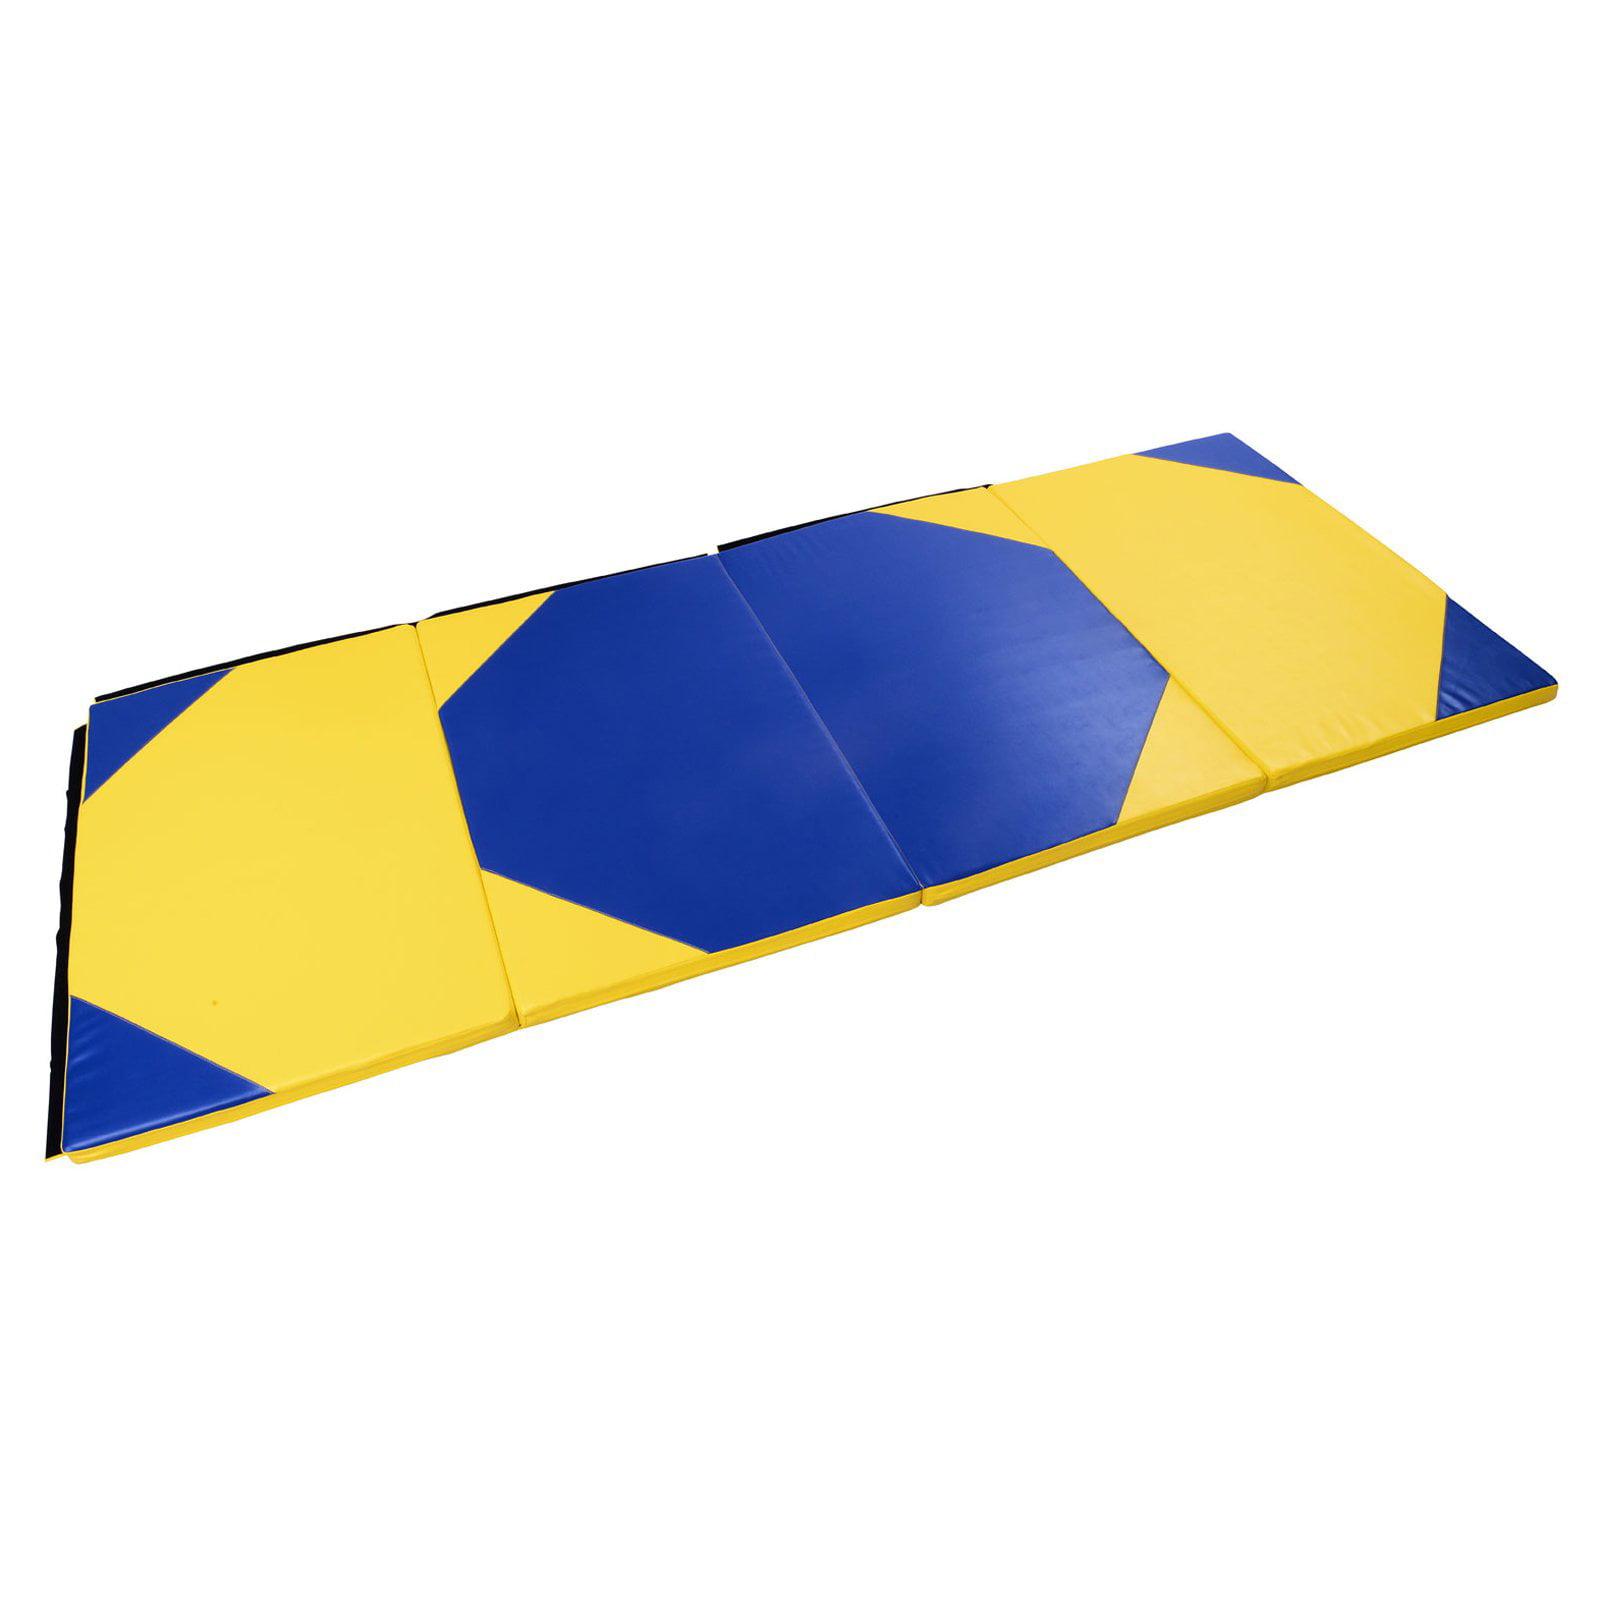 Soozier Rhombus Gymnastics Tumbling Martial Arts Folding